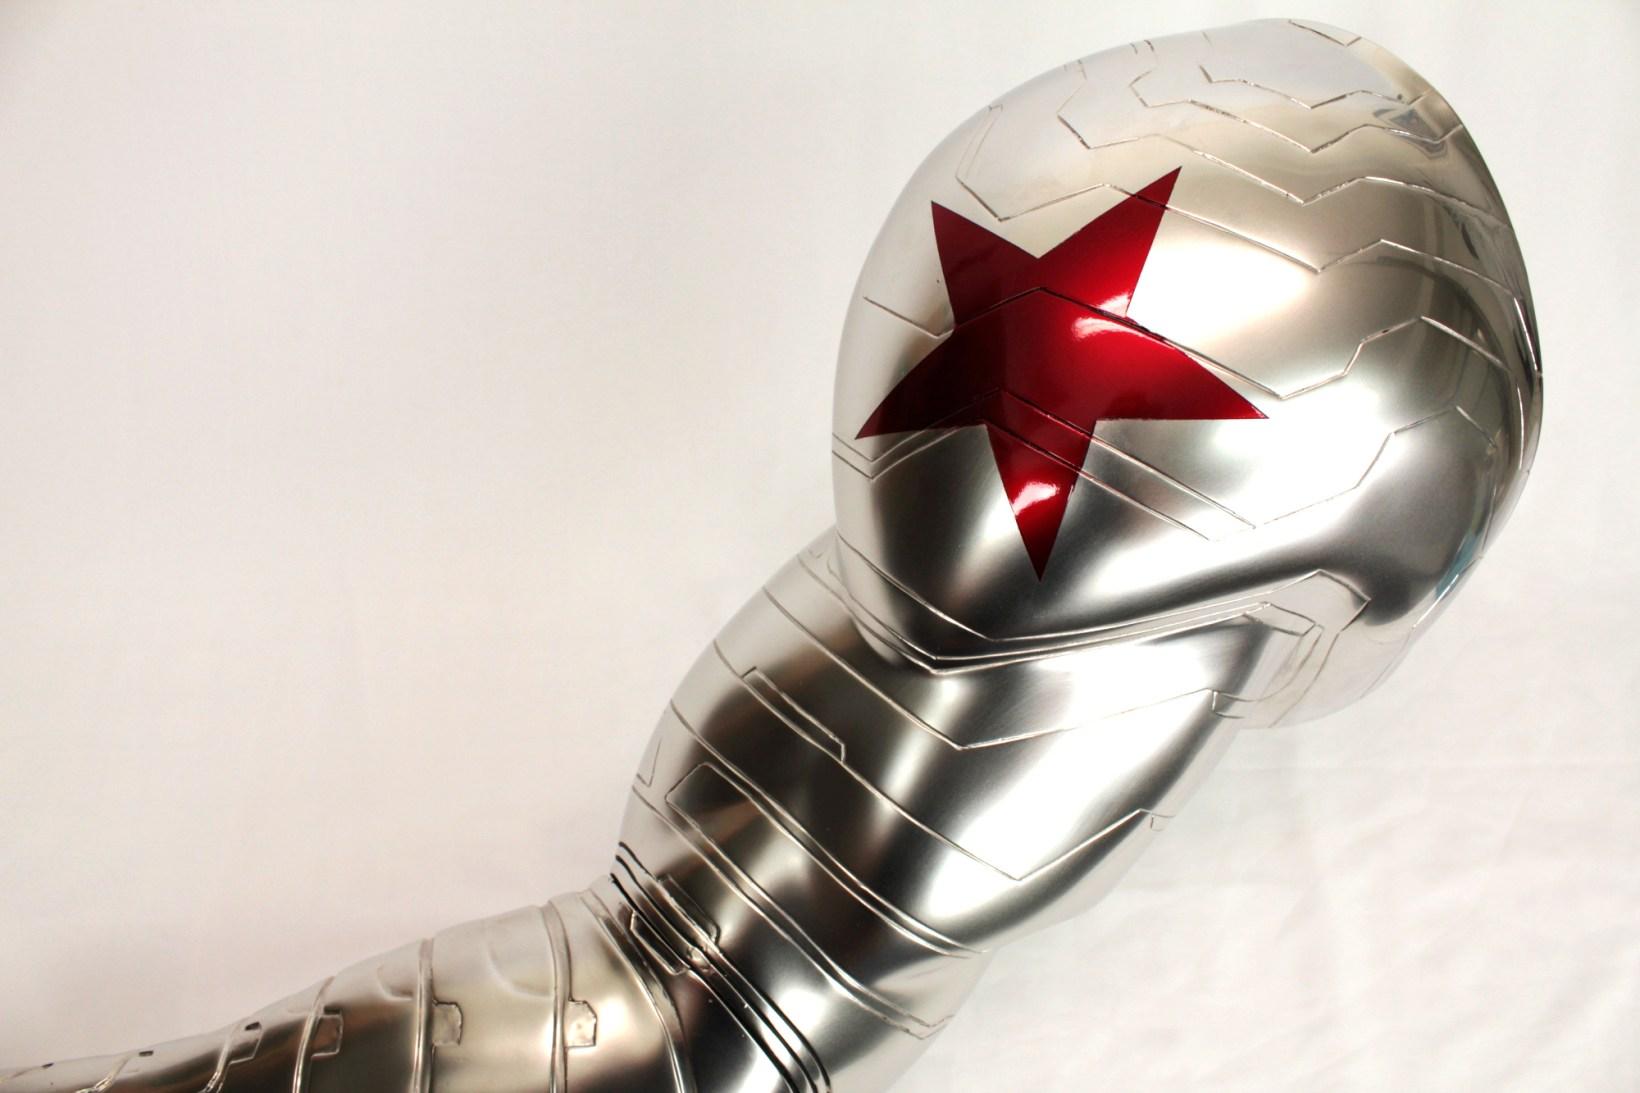 Winter Soldier Arm - SRI (4)